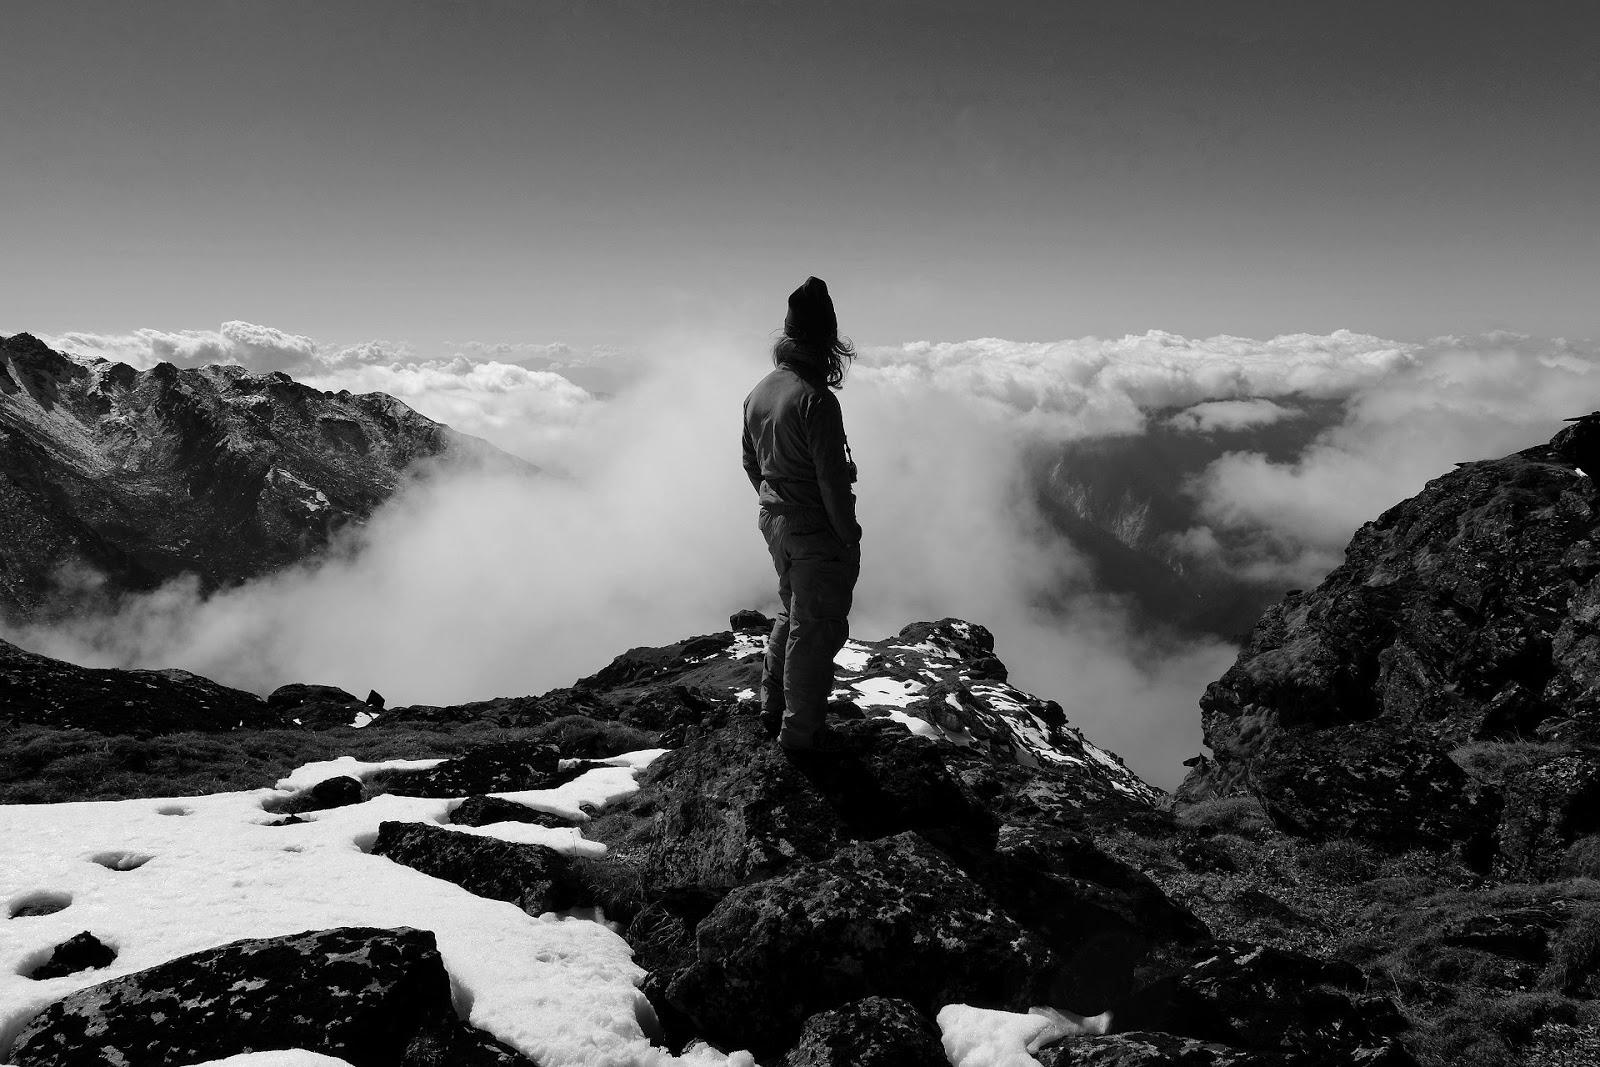 The Clouds Beneath My Feet, Kanchenjunga-2013. Где-то между Tseram и Ghunsa на высоте 4700 метров | автор Олег Бартунов